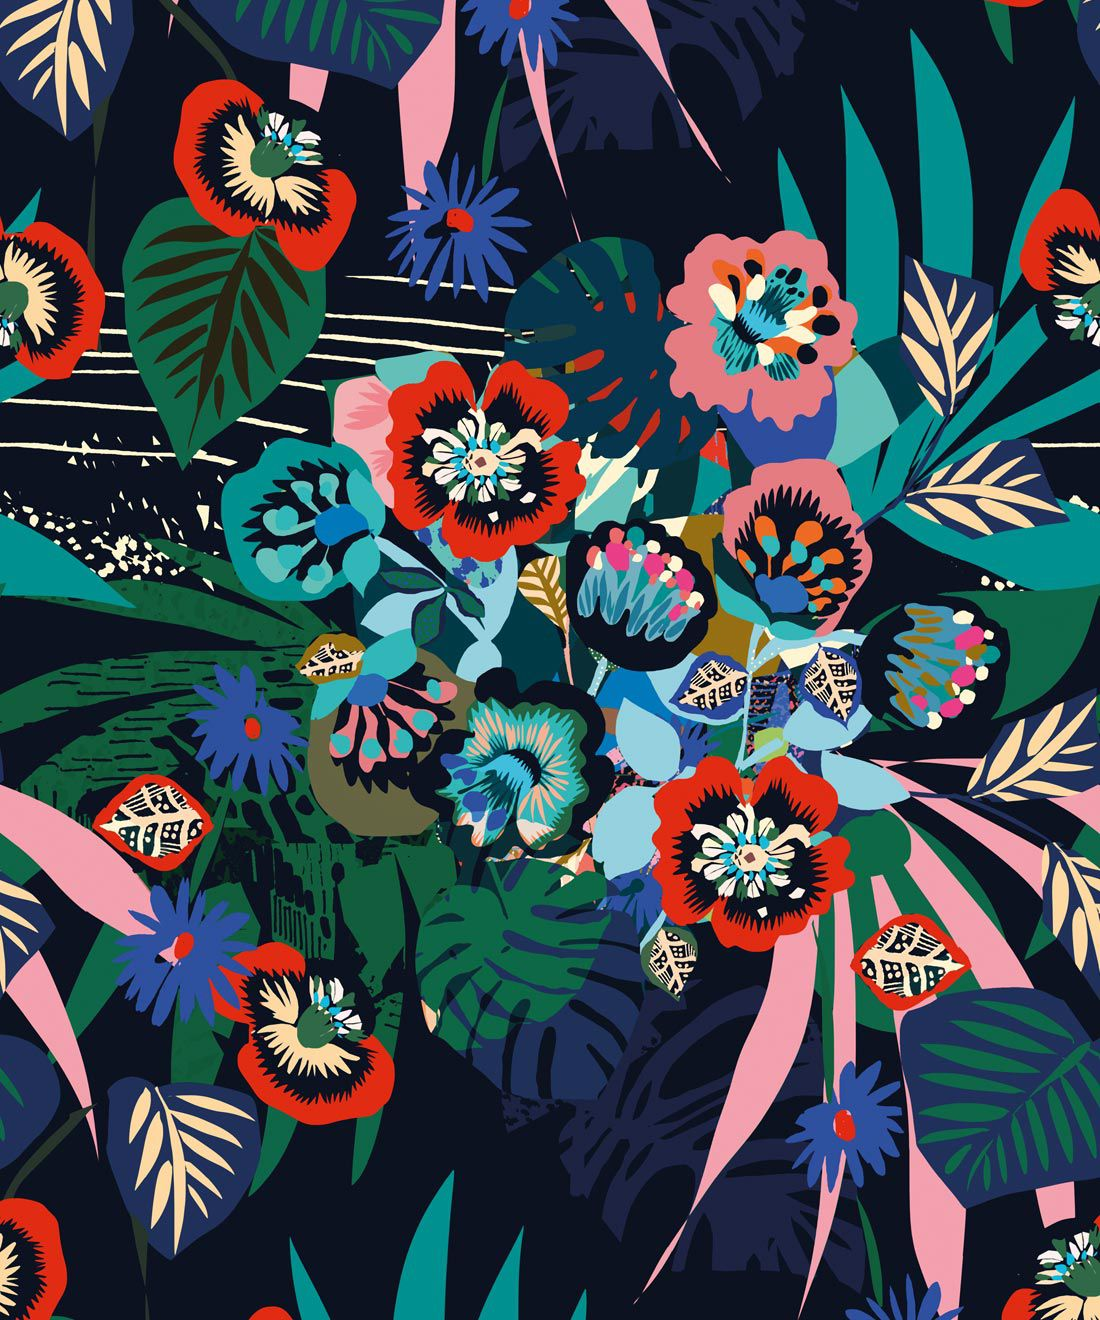 Kyoto Wallpaper • Kimono Wallpaper • Japanese Wallpaper • Deep Colourful Wallpaper • Swatch